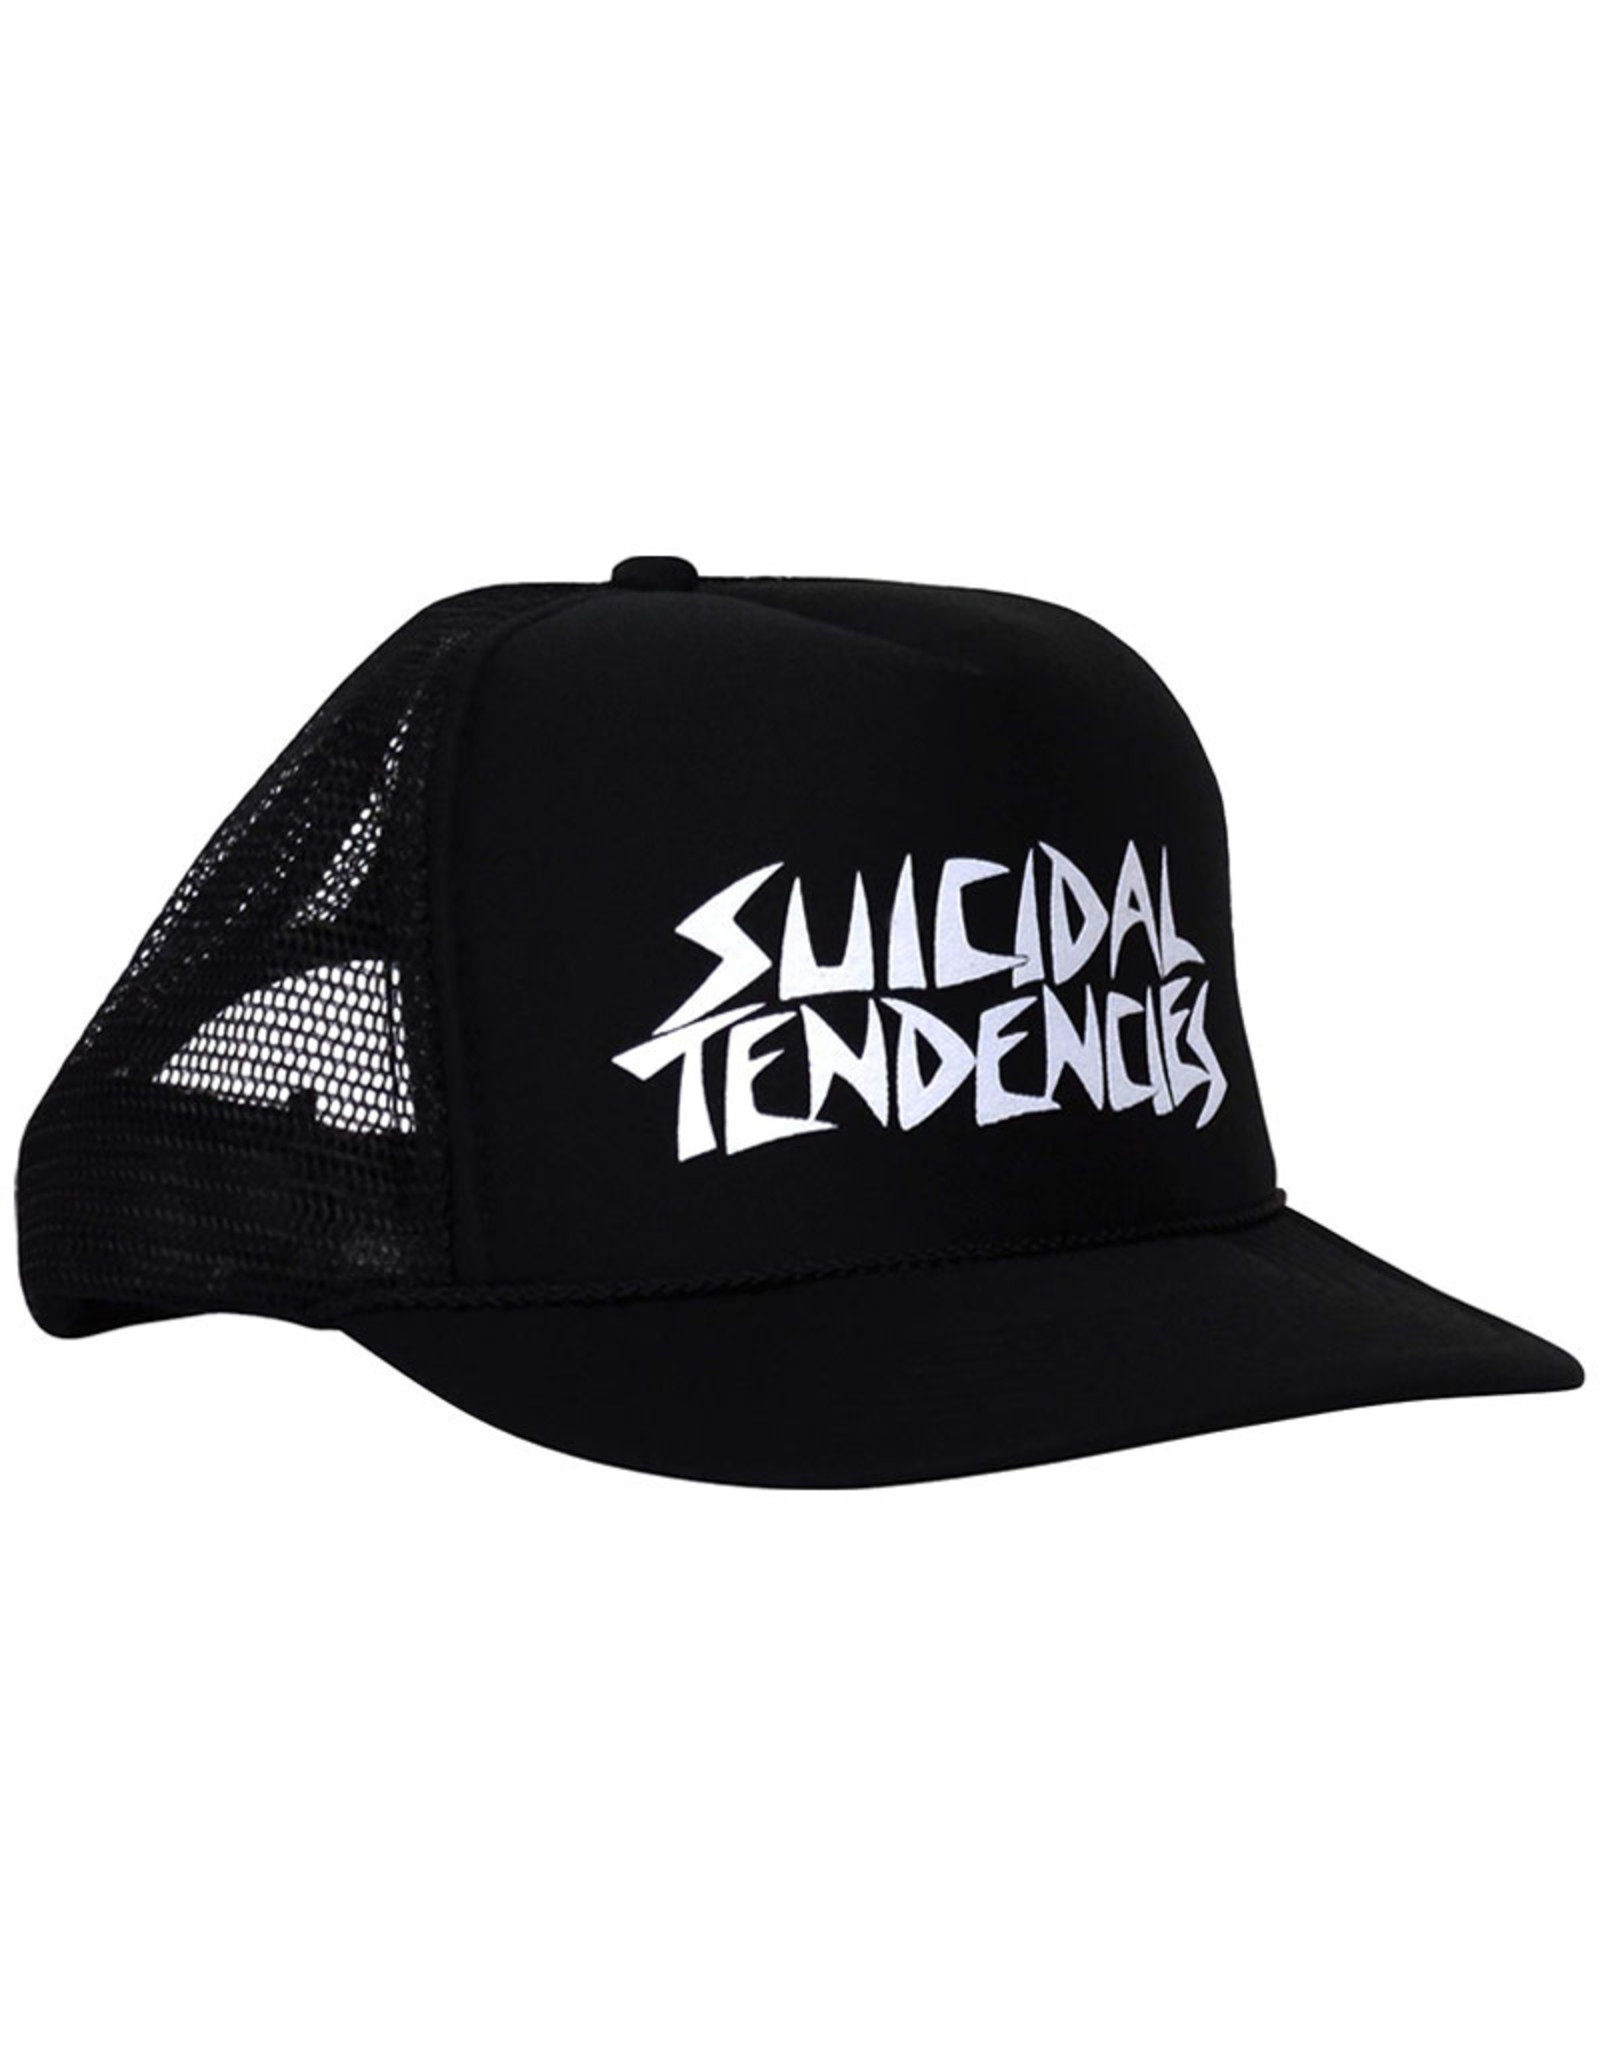 Star 500 Concert Series On Hollywood Hat Suicidal Tendencies Logo Snapback Trucker (Black)